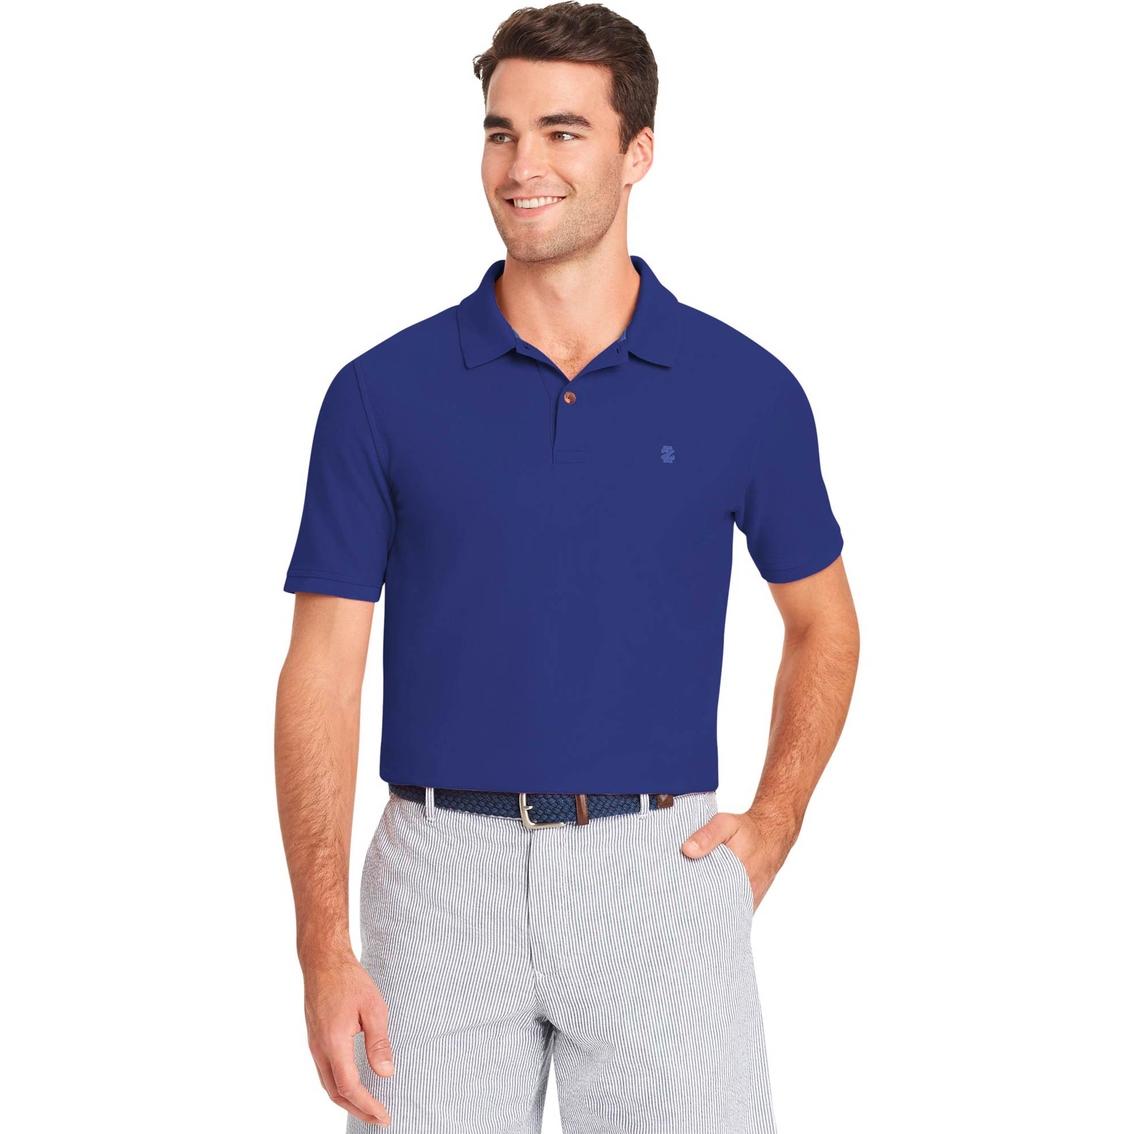 d2bc66315 Izod Polo Shirts Mens - DREAMWORKS